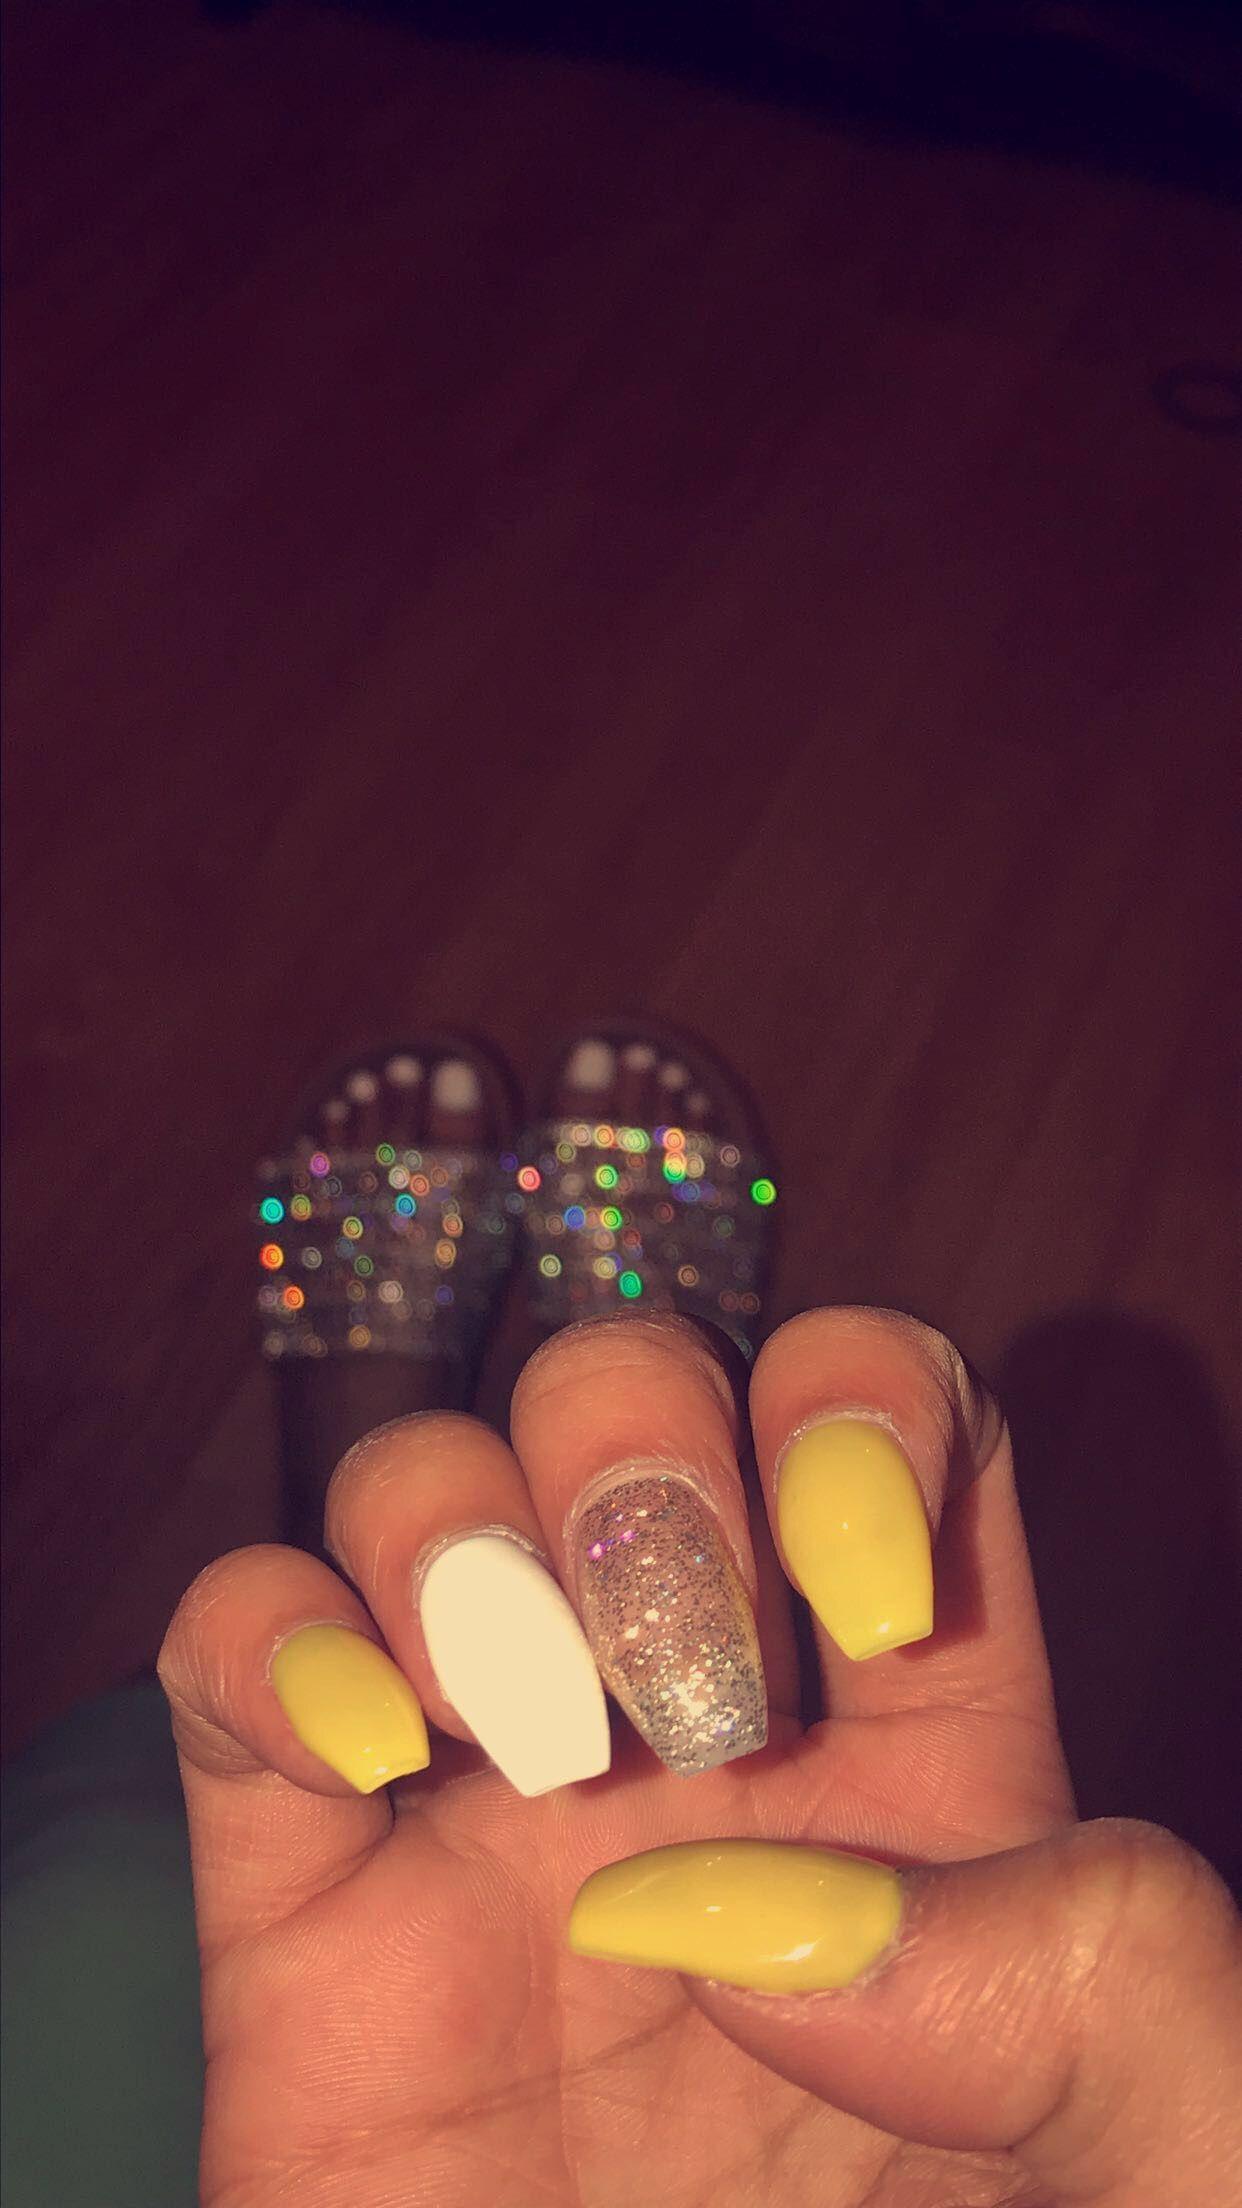 Acrylic Nails Yellow White Sparkles Acrylic Nails Yellow Yellow Nails Yellow Nails Design